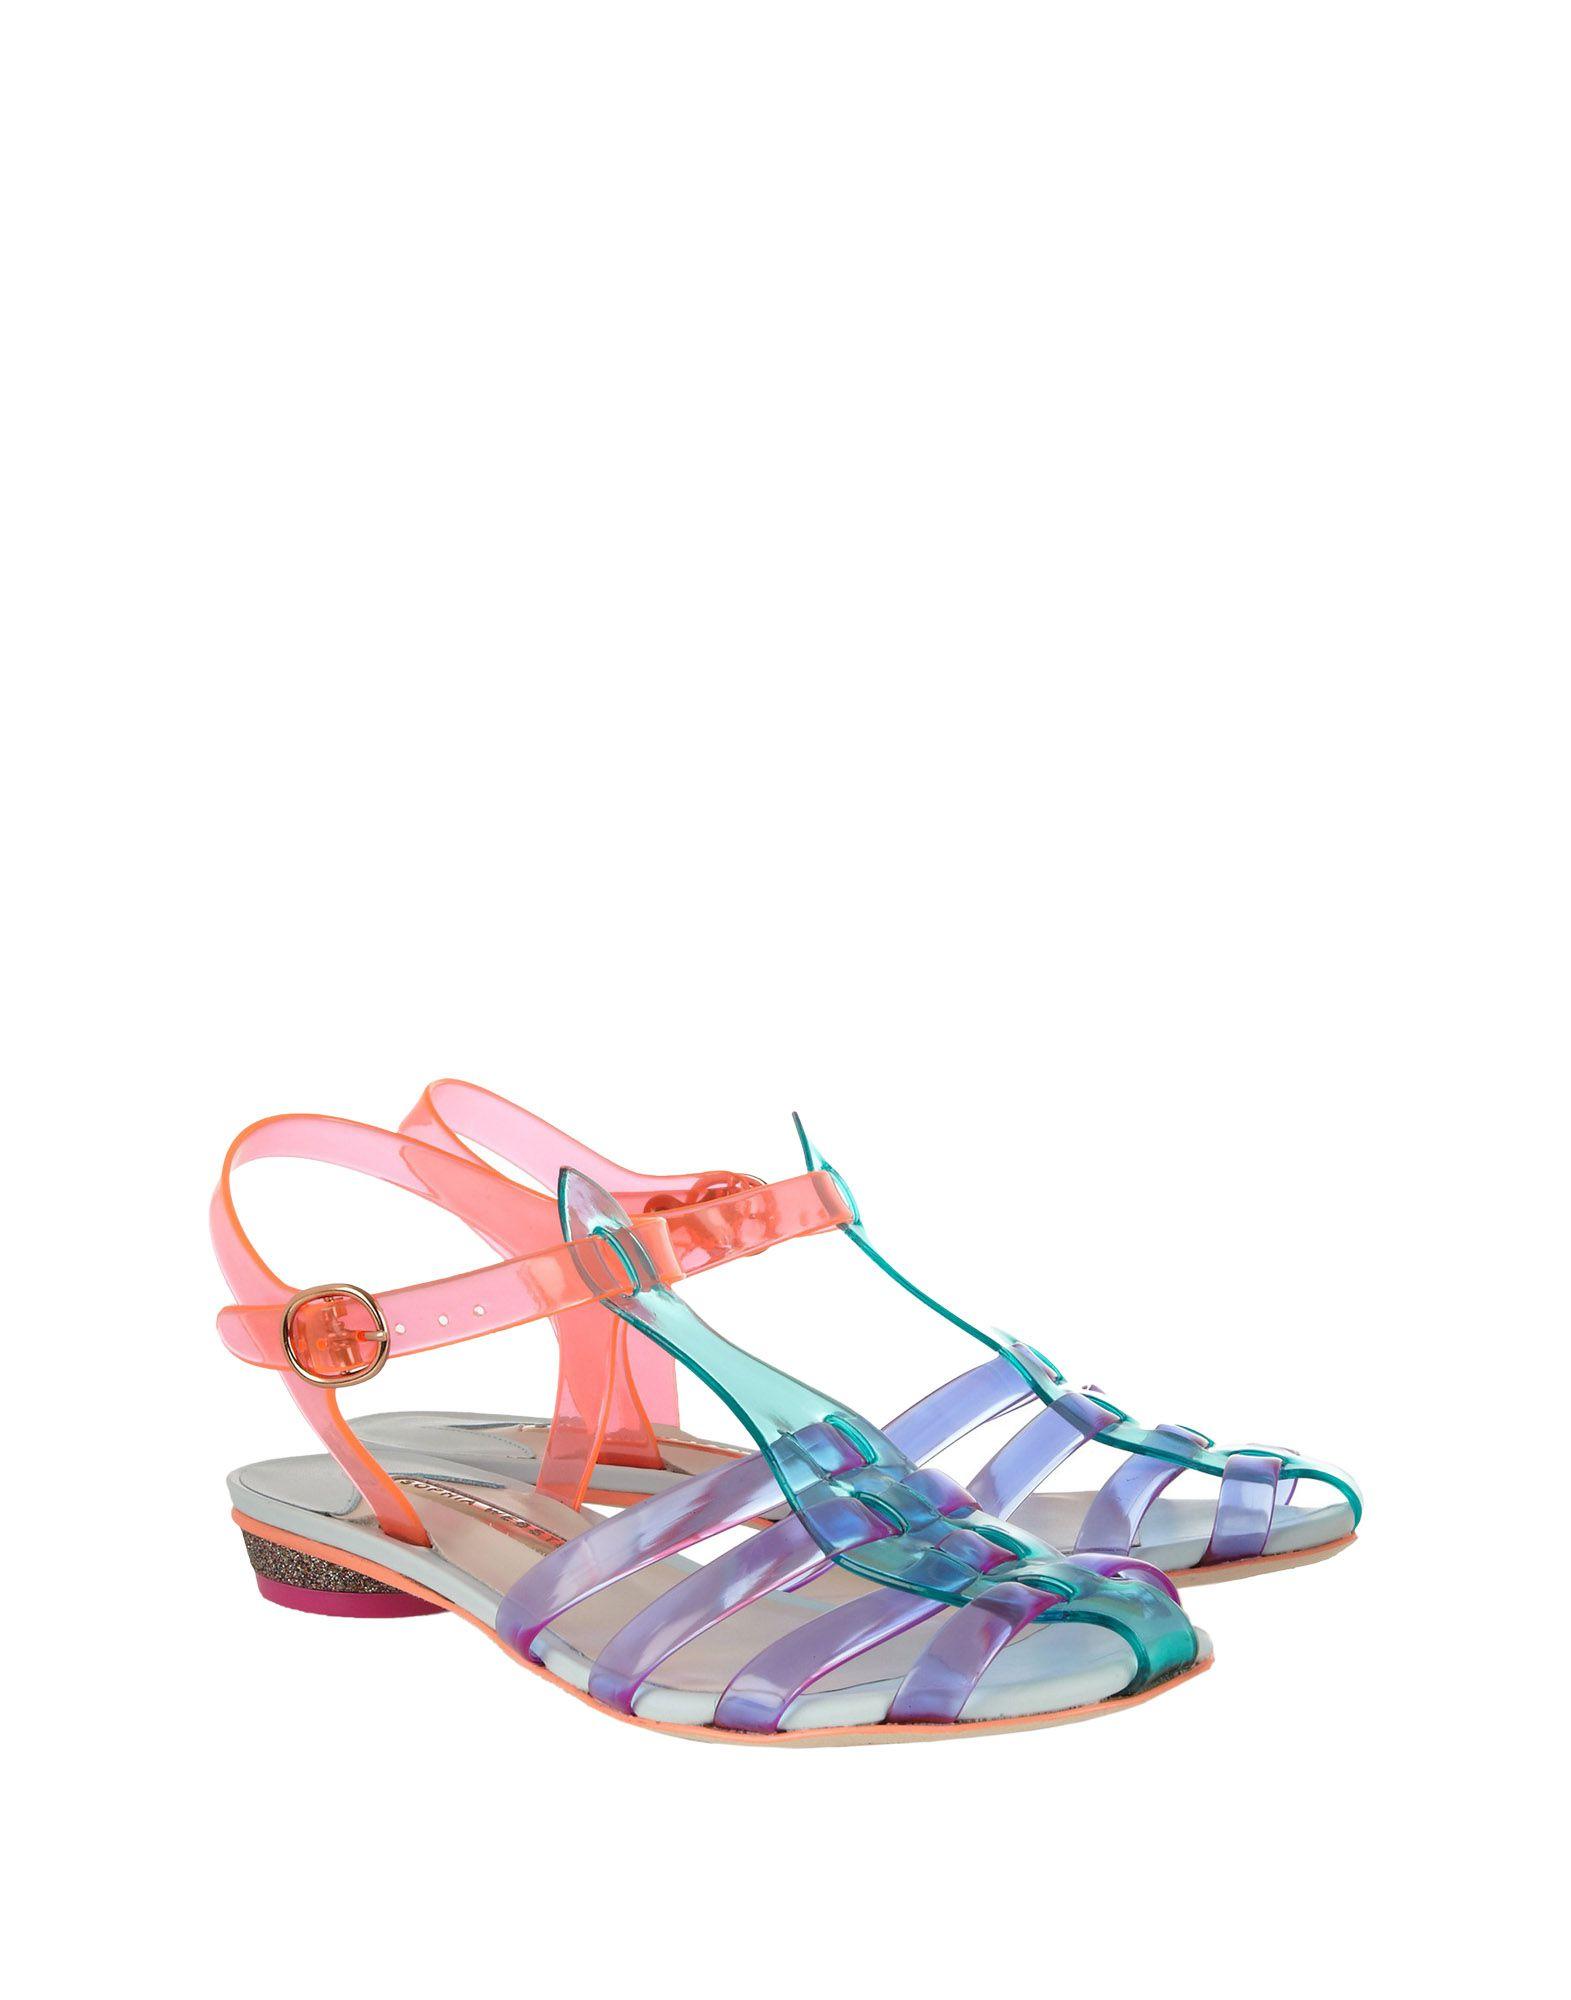 Sophia Webster Sandalen Damen  11515250XB Gute Qualität beliebte Schuhe